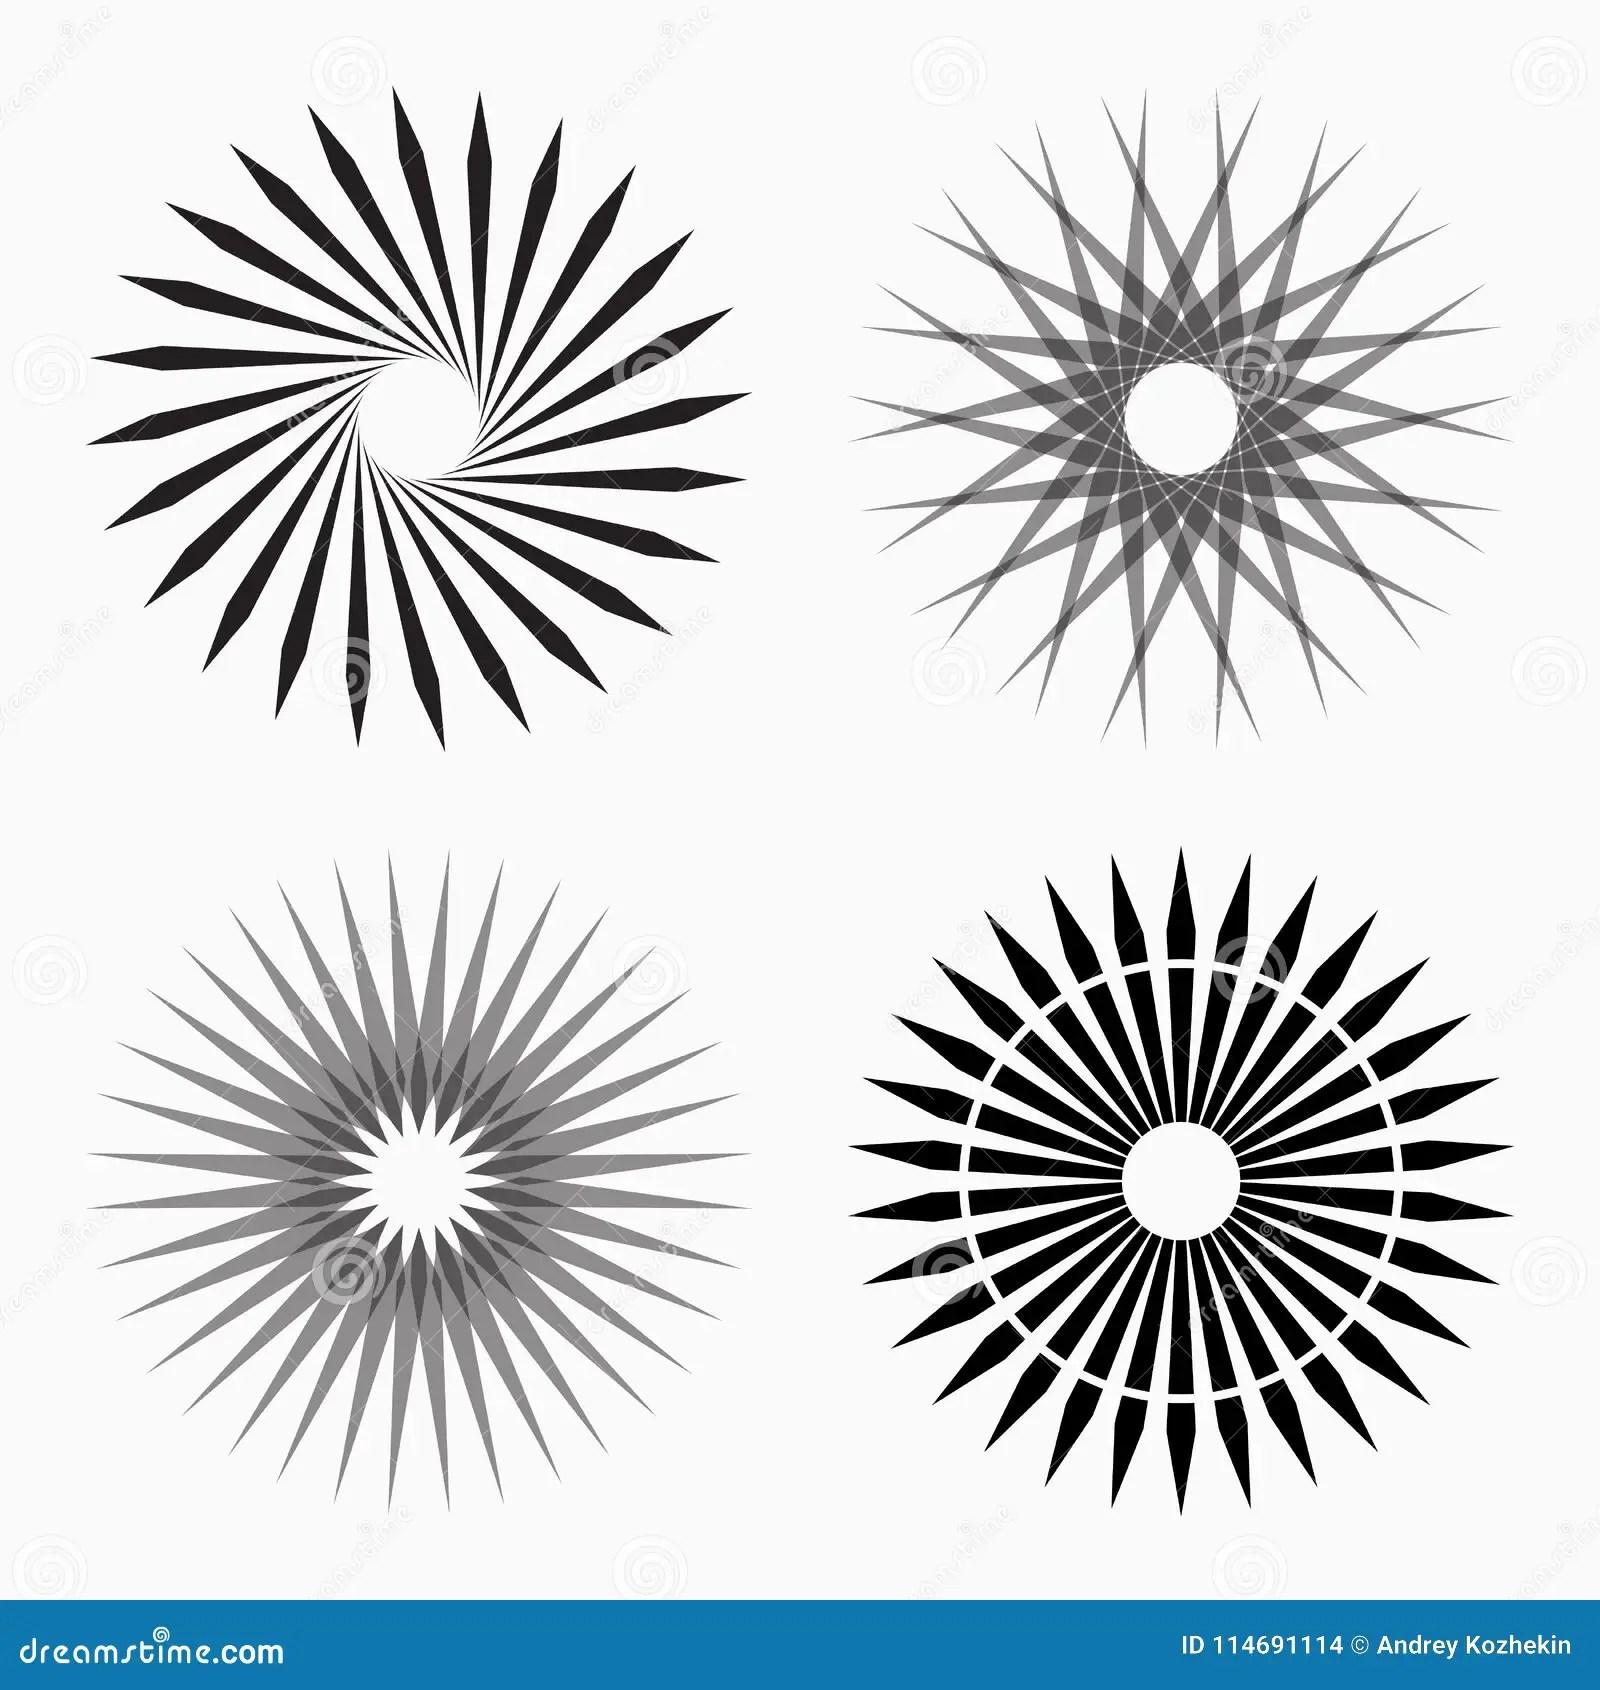 Abstract Circular Geometric Shapes Stock Vector